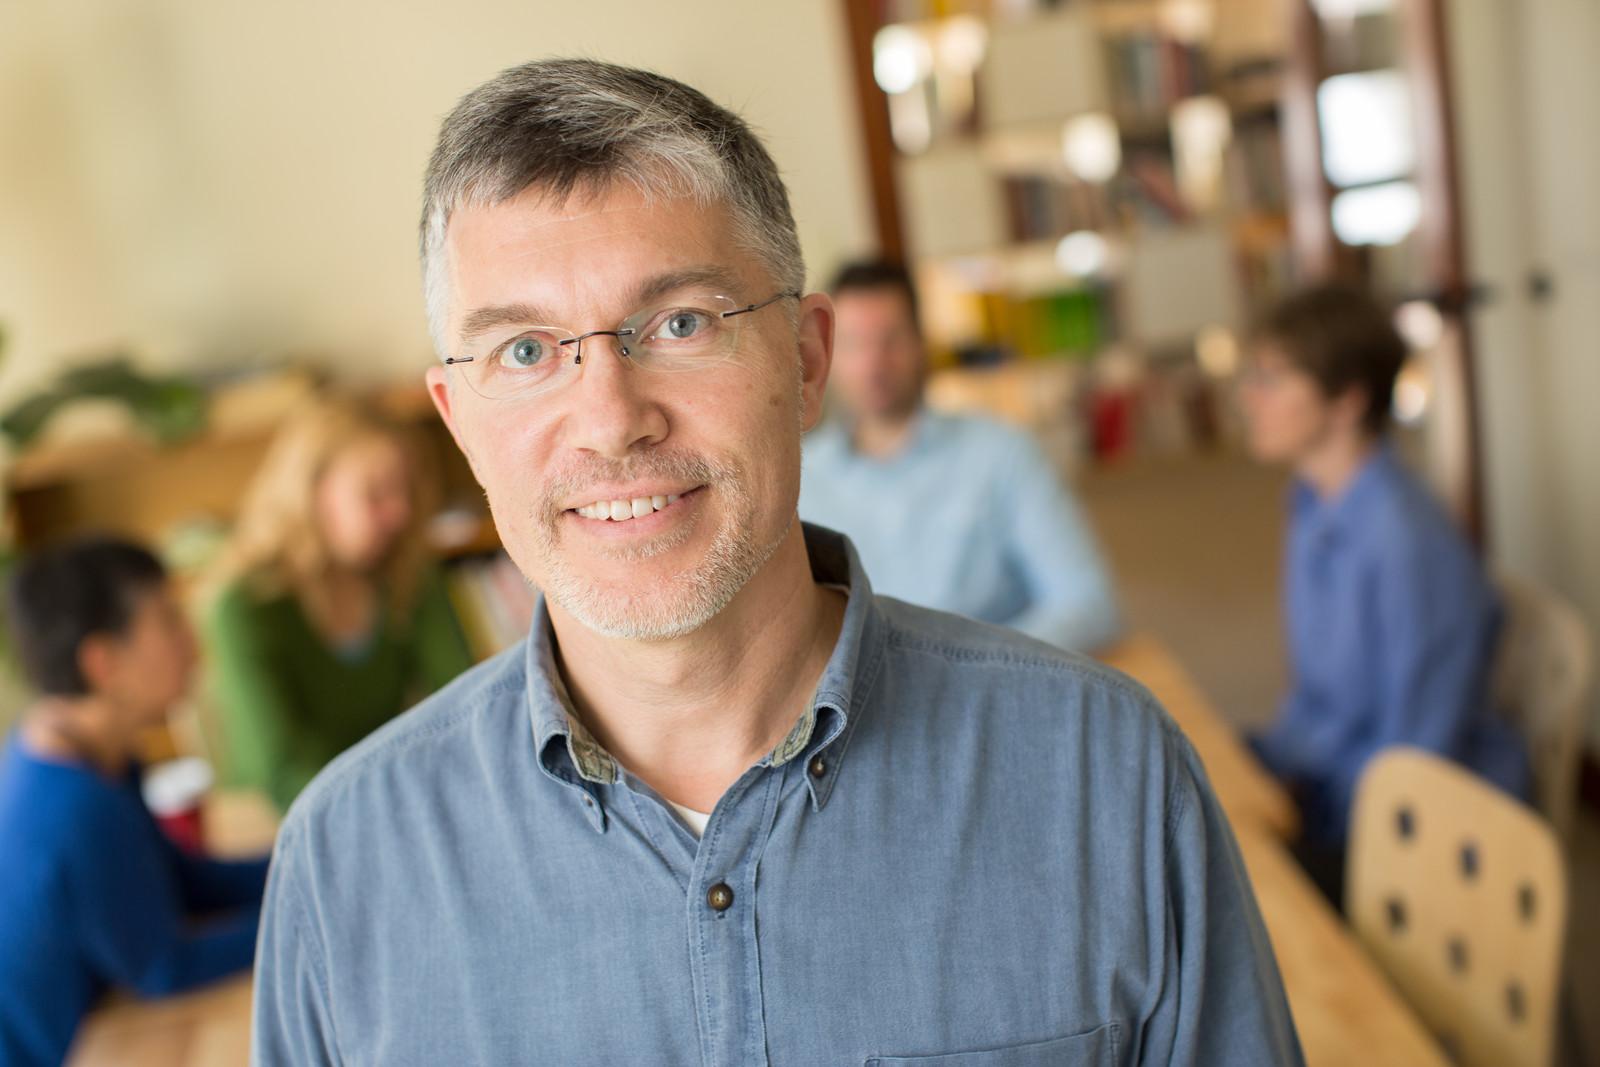 Chris Hutchinson is trebuchet group's Abundance Influencer